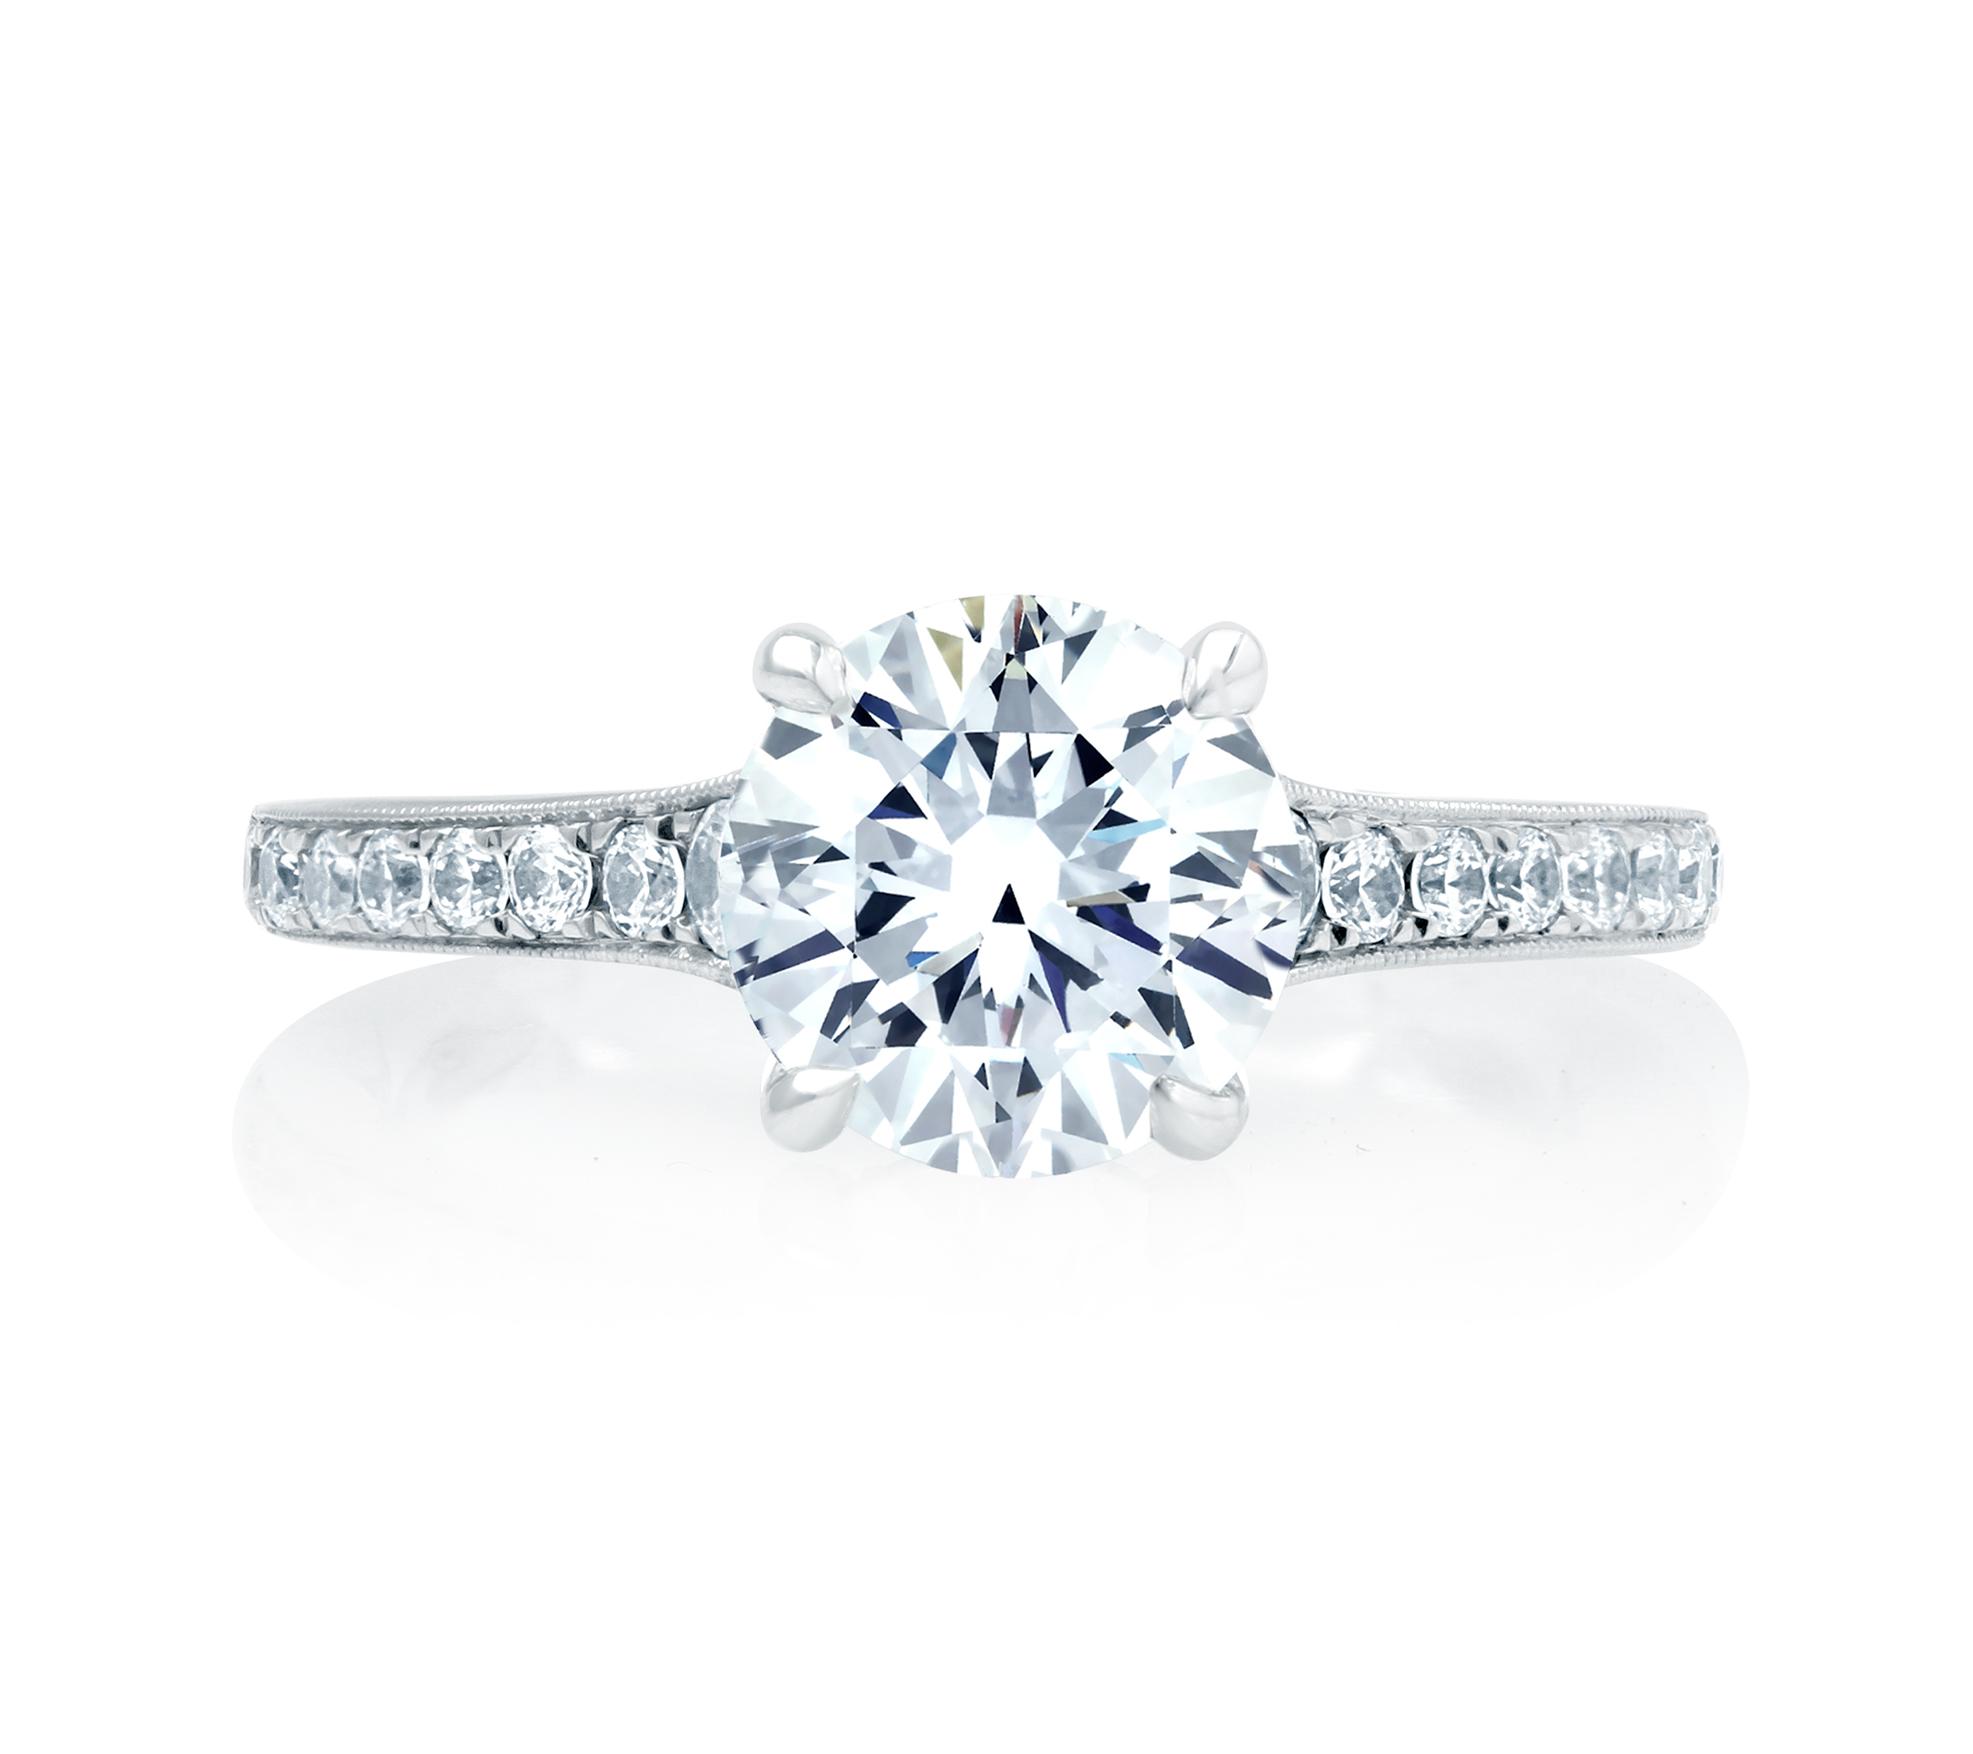 A.Jaffe Rings | Van Gundy Jewelers | Camarillo, CA